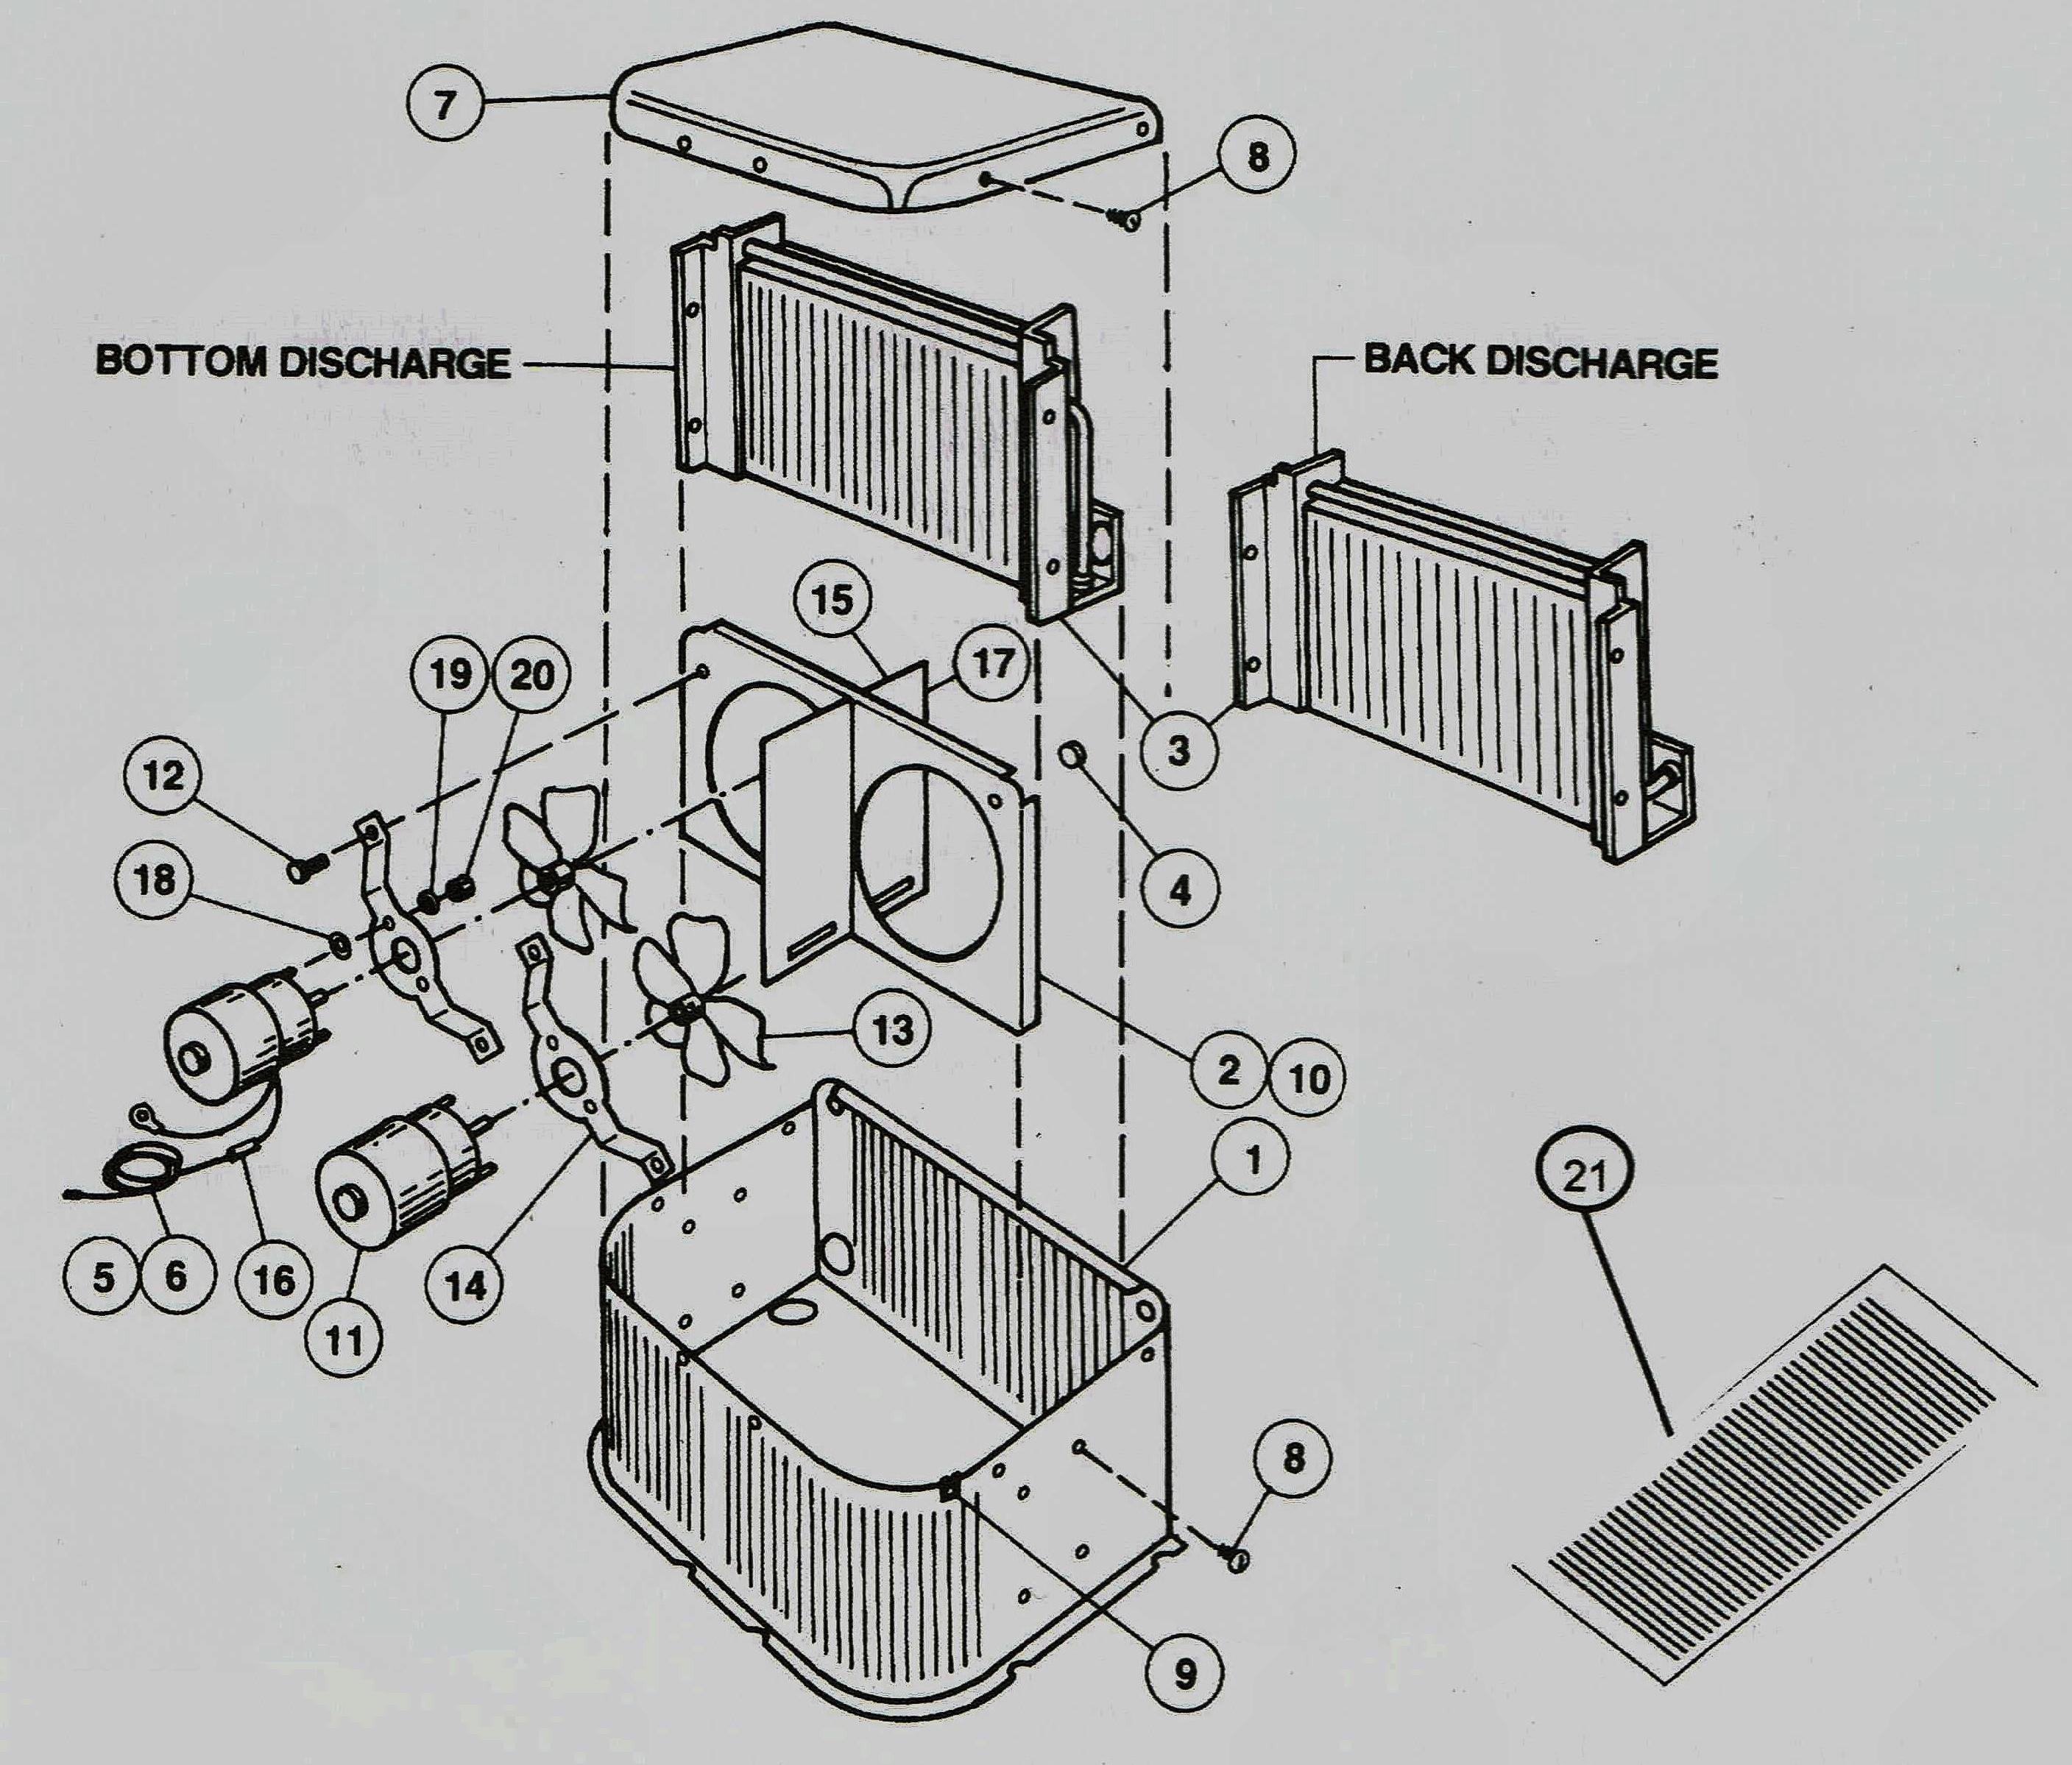 evans tempcon rv wiring diagrams wiring diagramevans tempcon rv wiring diagrams